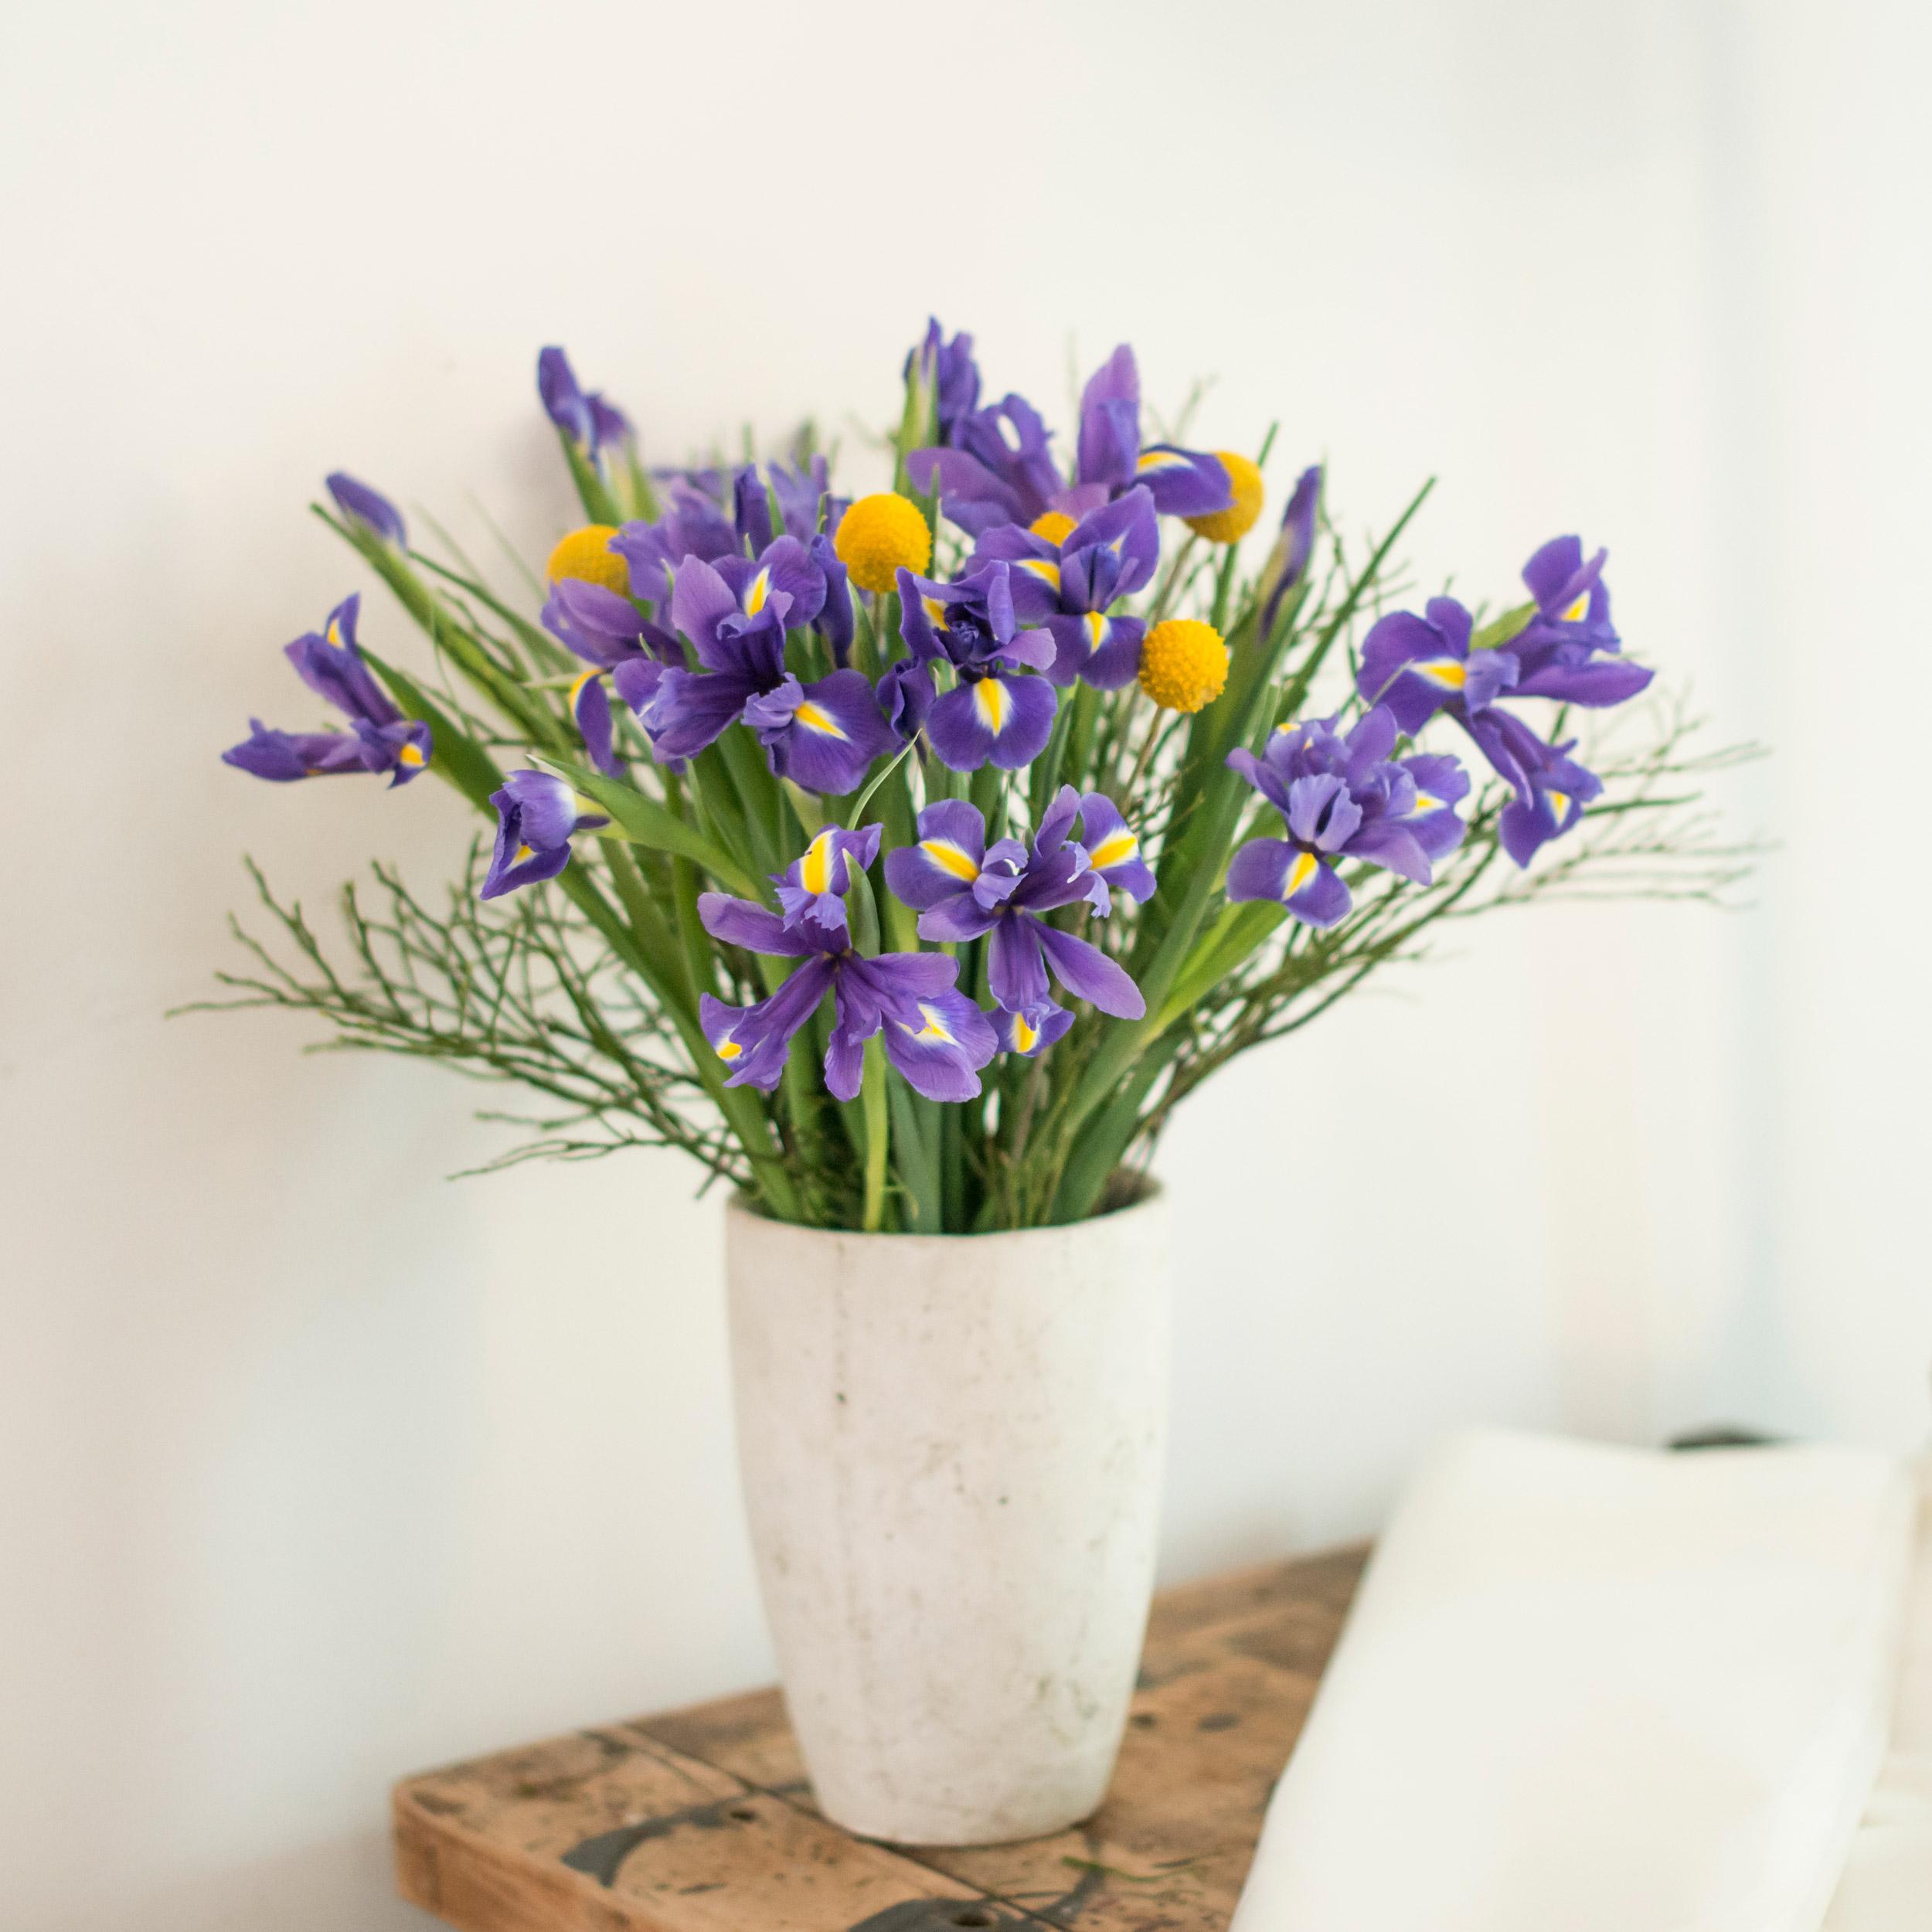 Iris Blumen Pflege